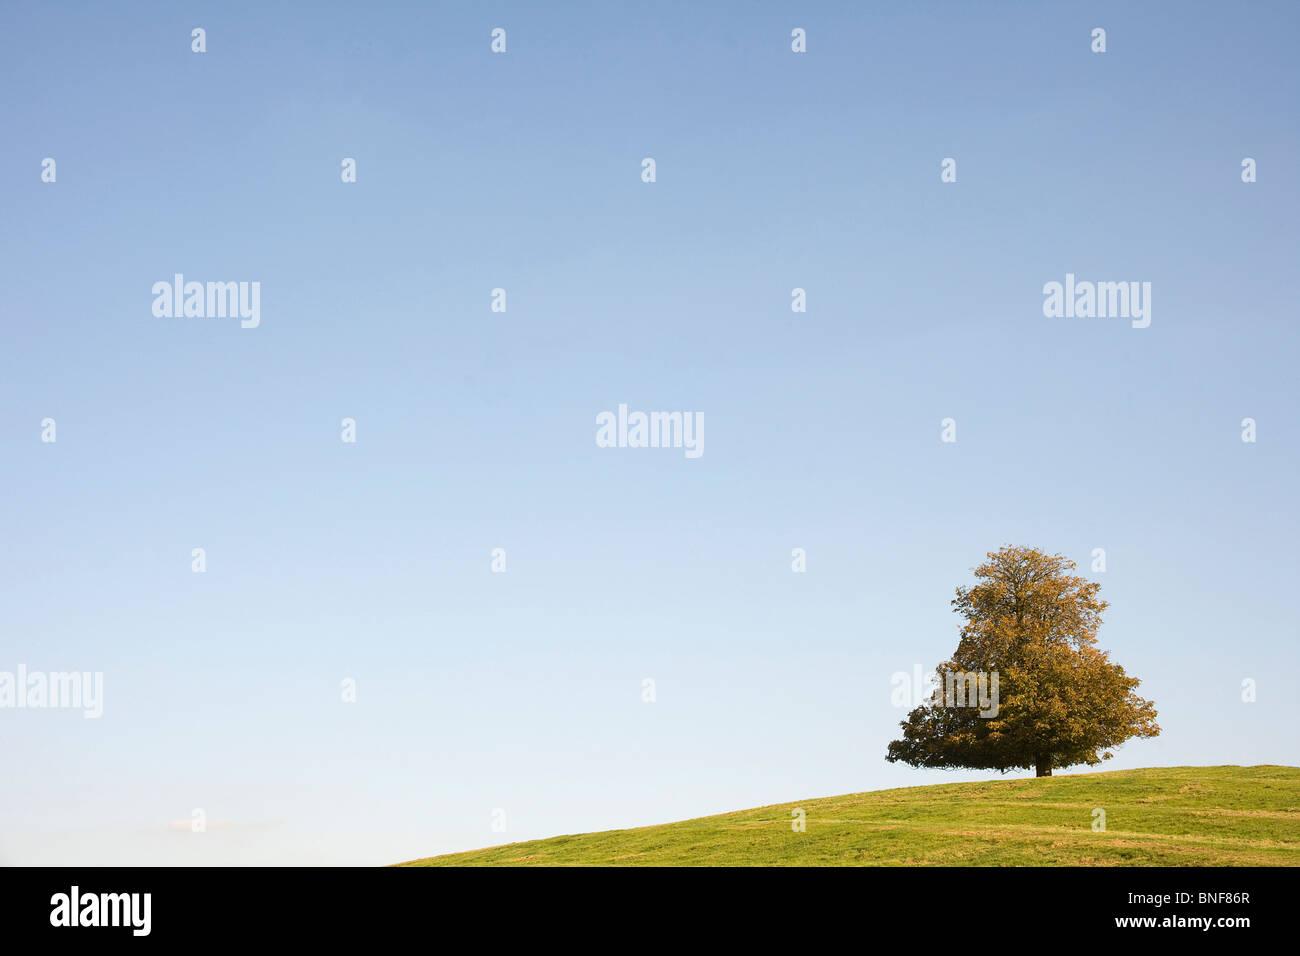 Tree in autumn - Stock Image